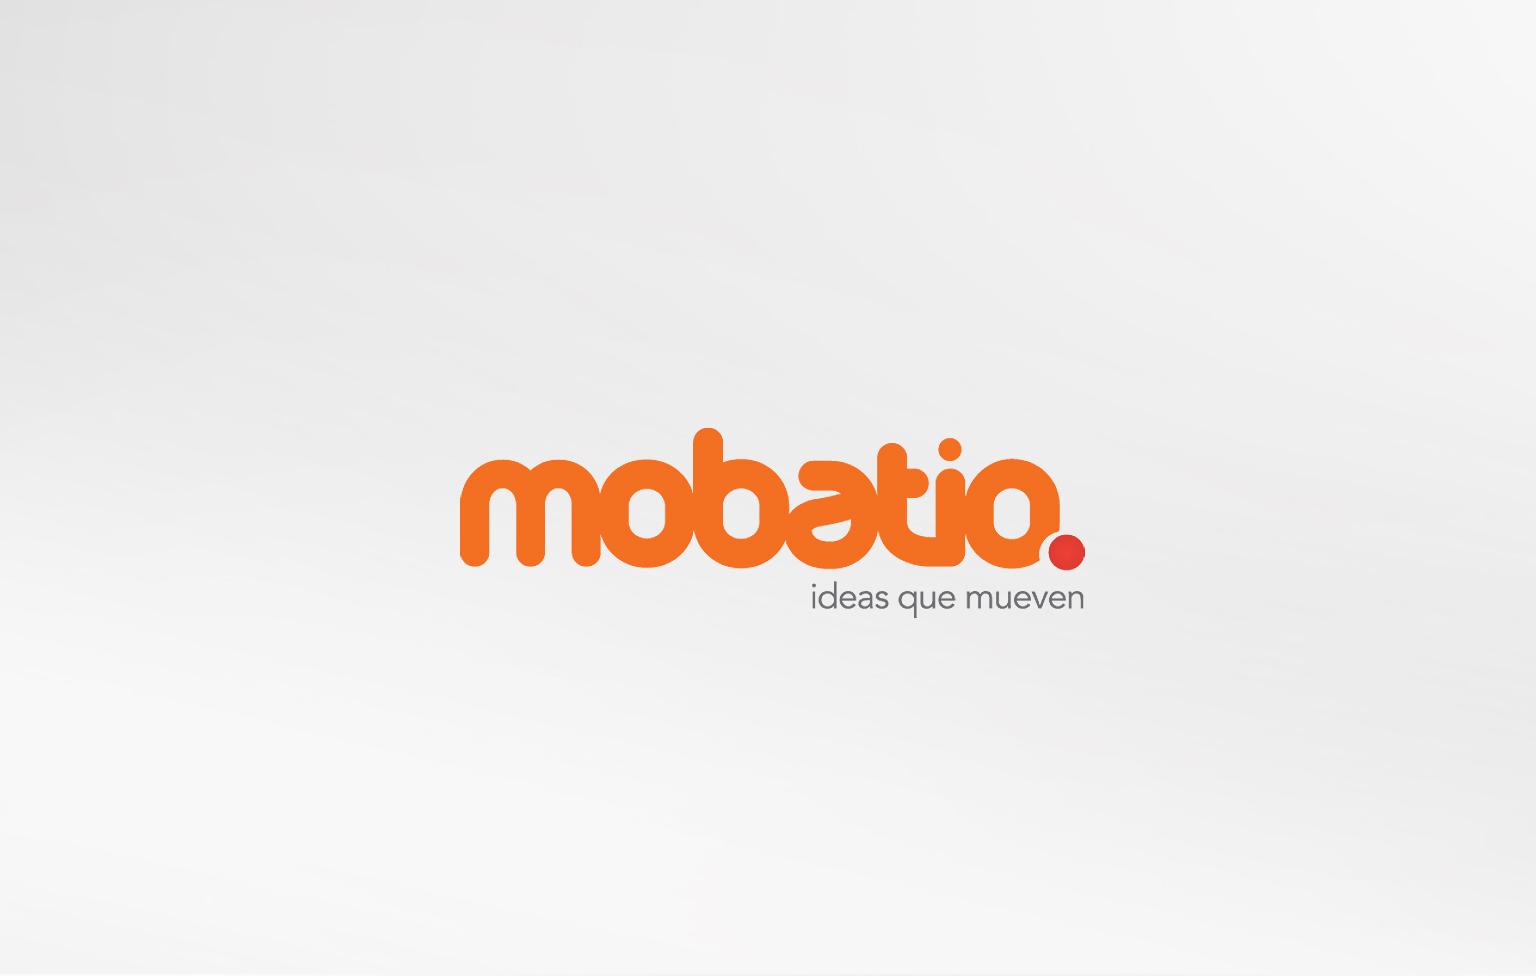 Mobatio